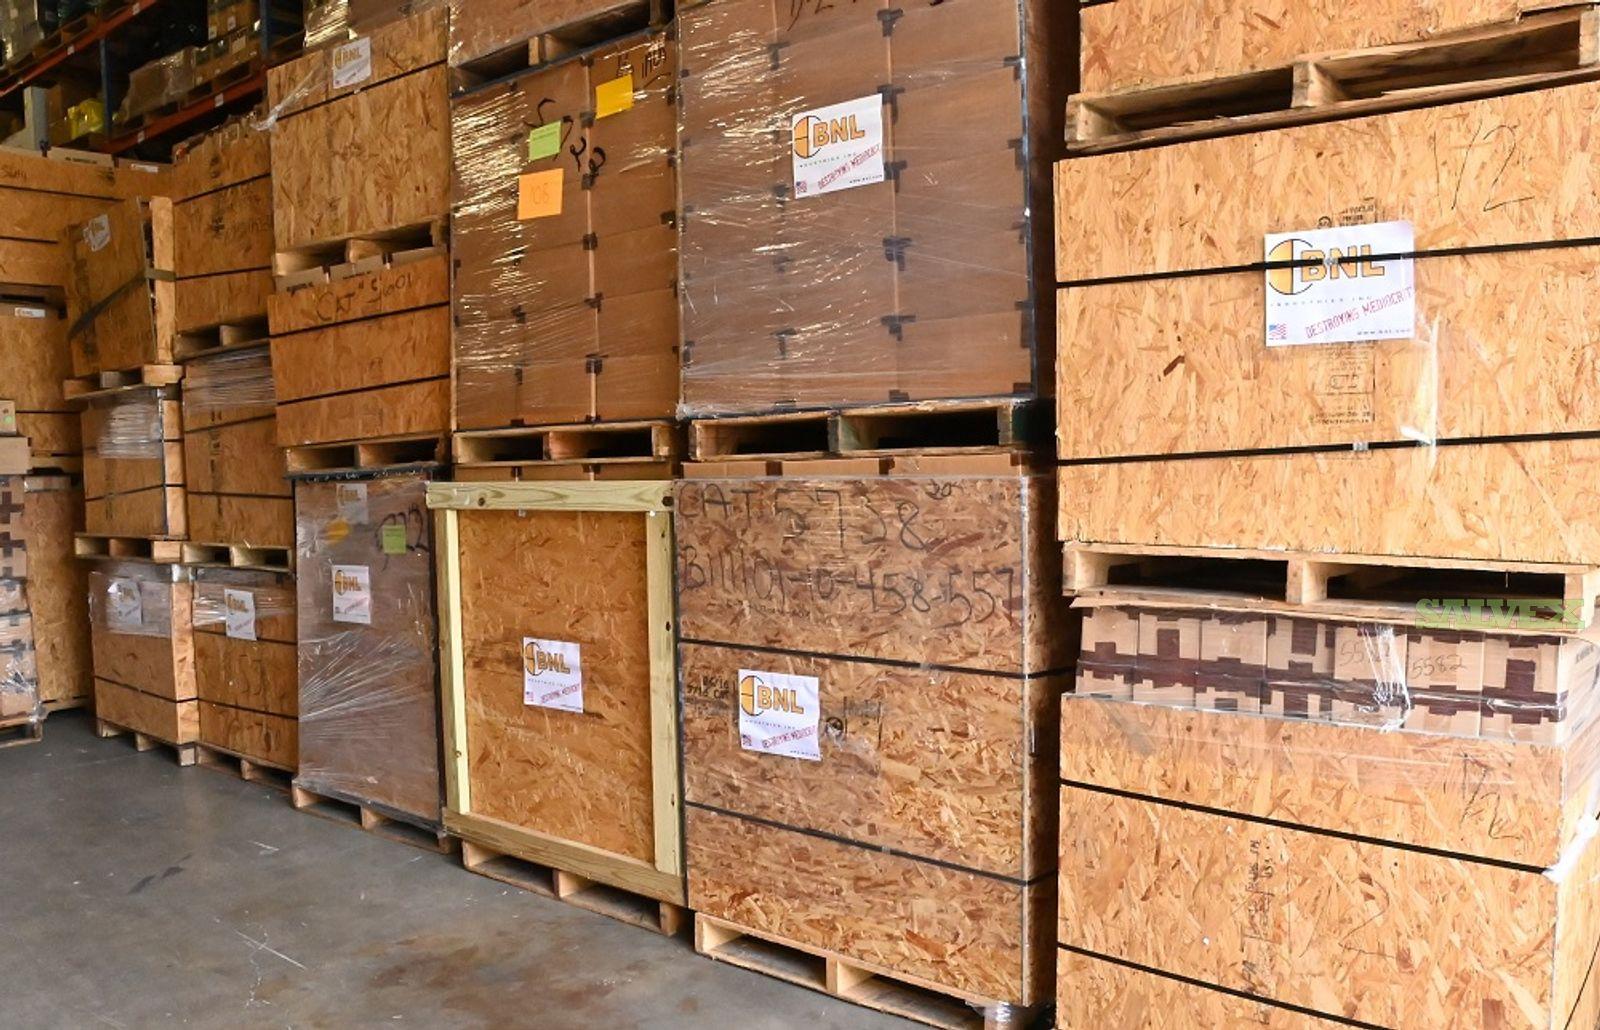 Over 40 Pallets 2 Truckloads